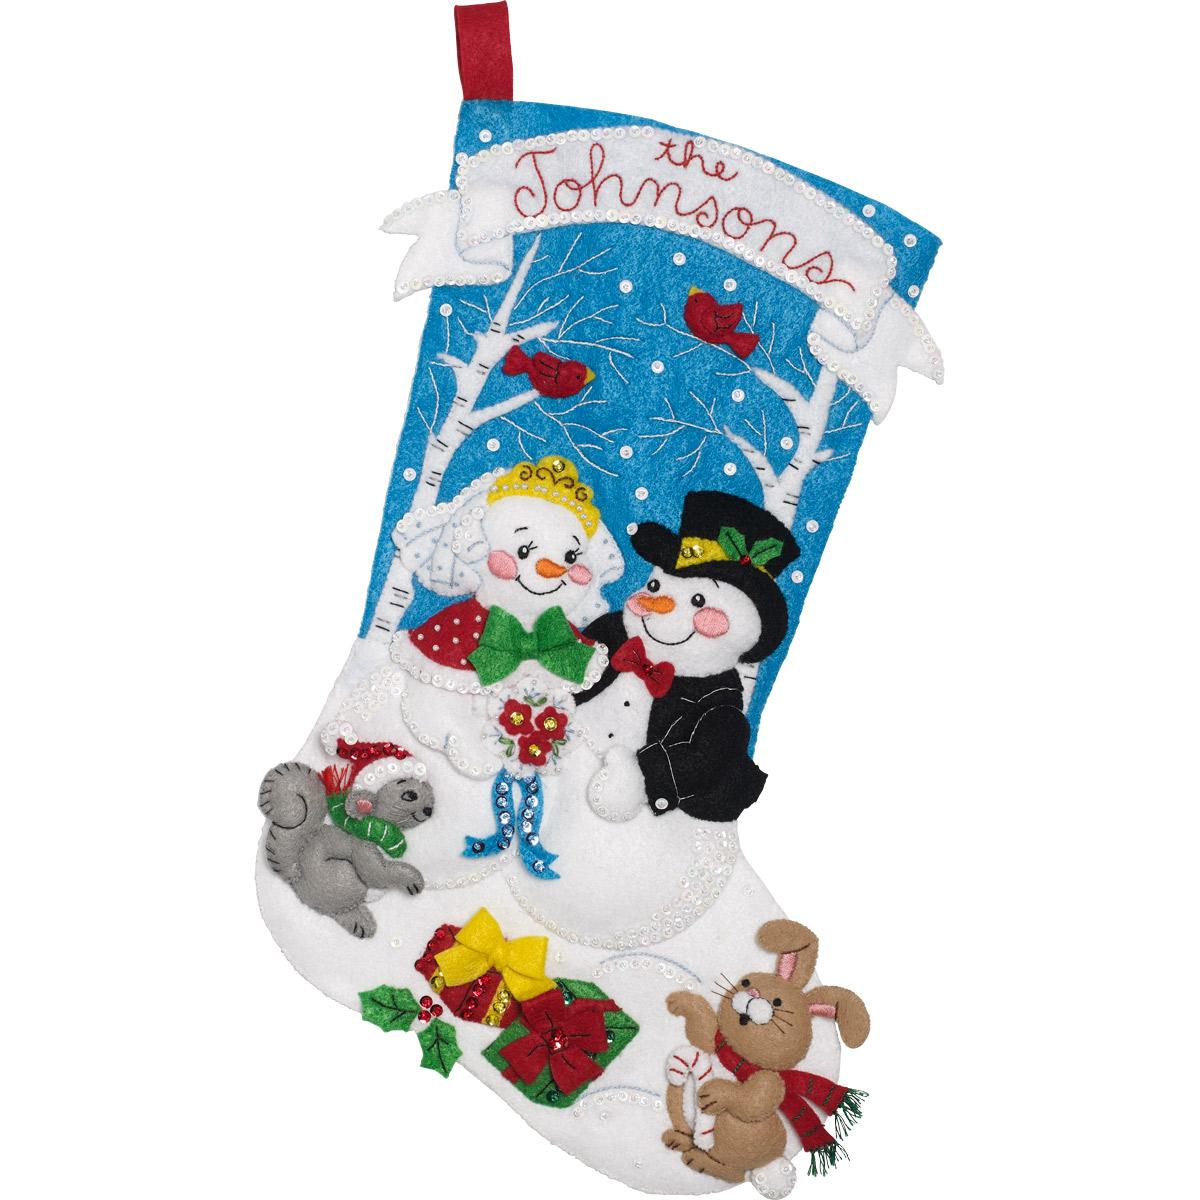 Bucilla ® Seasonal - Felt - Stocking Kits - Bride and Groom - 86943E